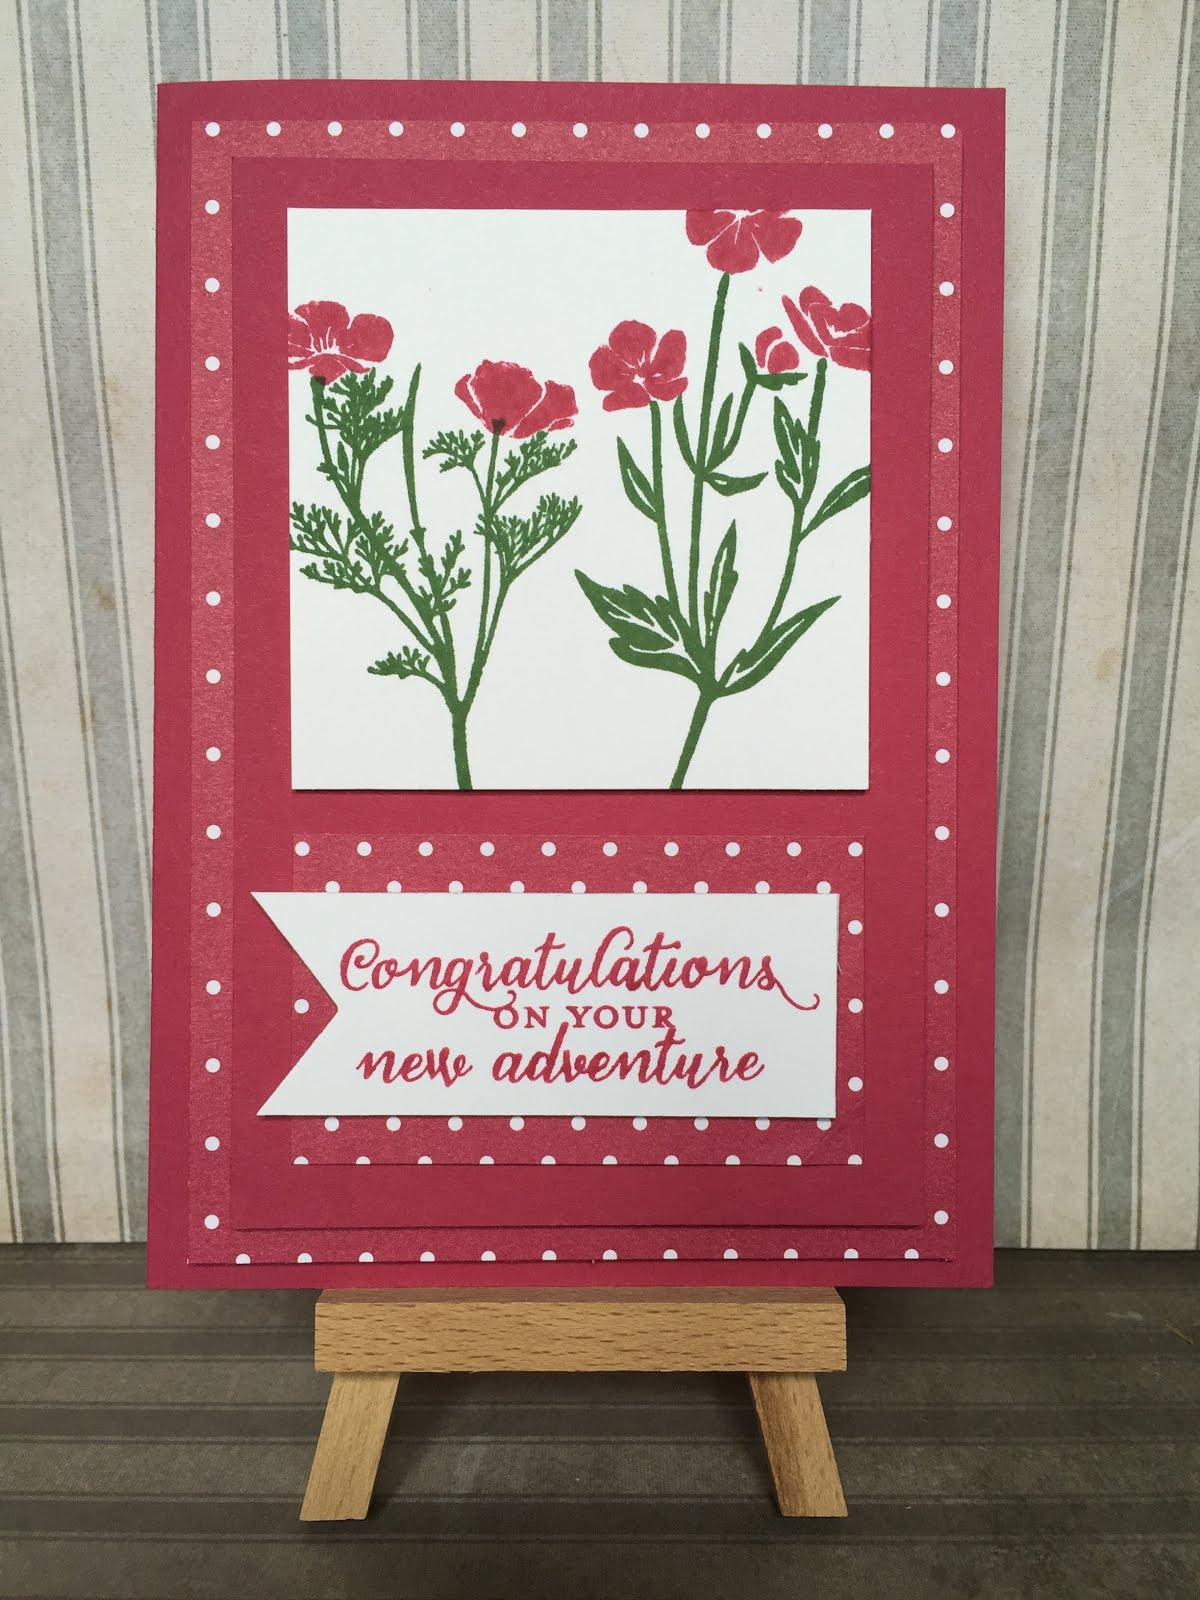 Congratulations in pink